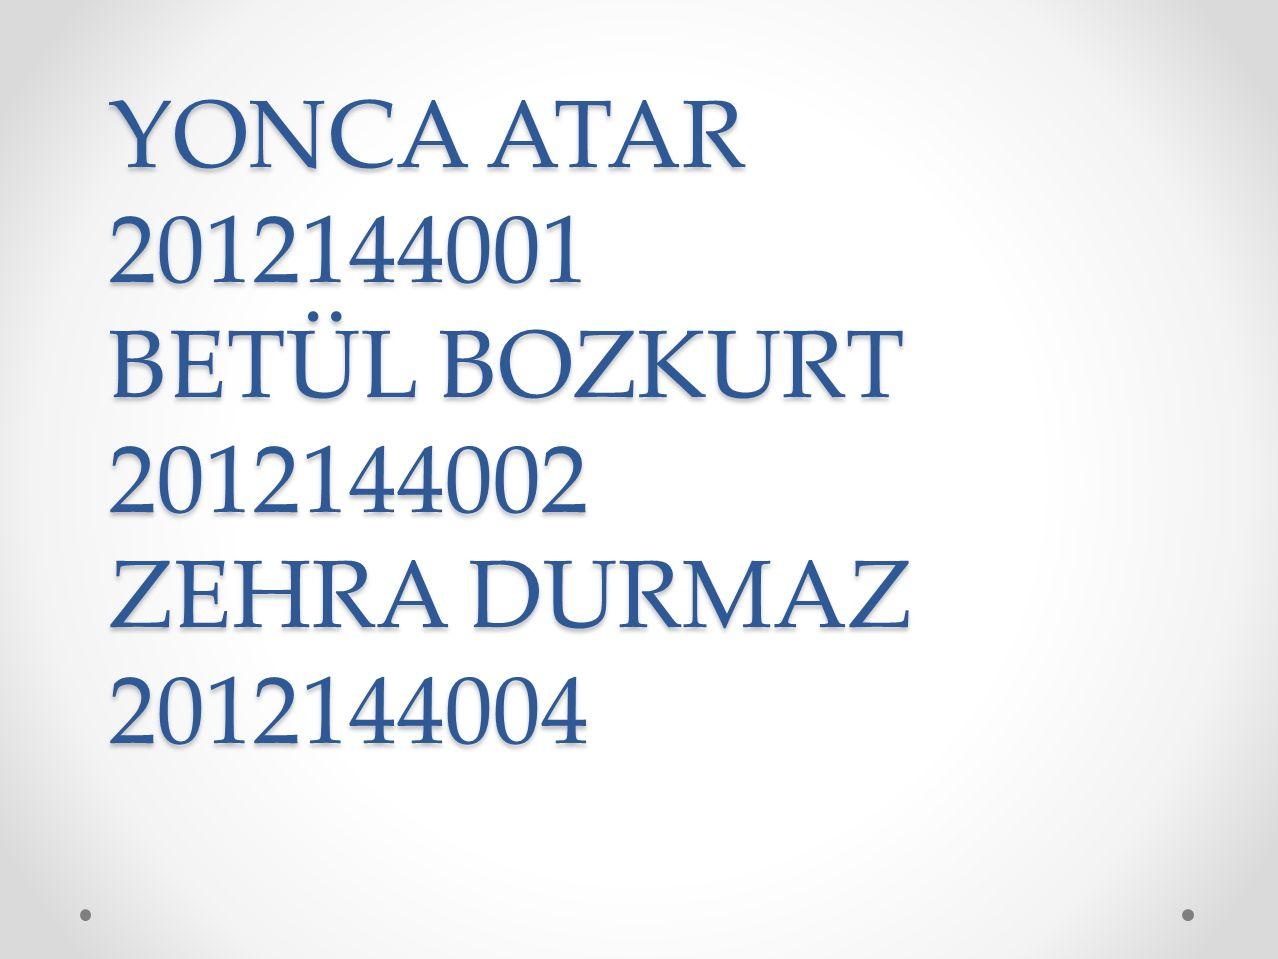 YONCA ATAR 2012144001 BETÜL BOZKURT 2012144002 ZEHRA DURMAZ 2012144004